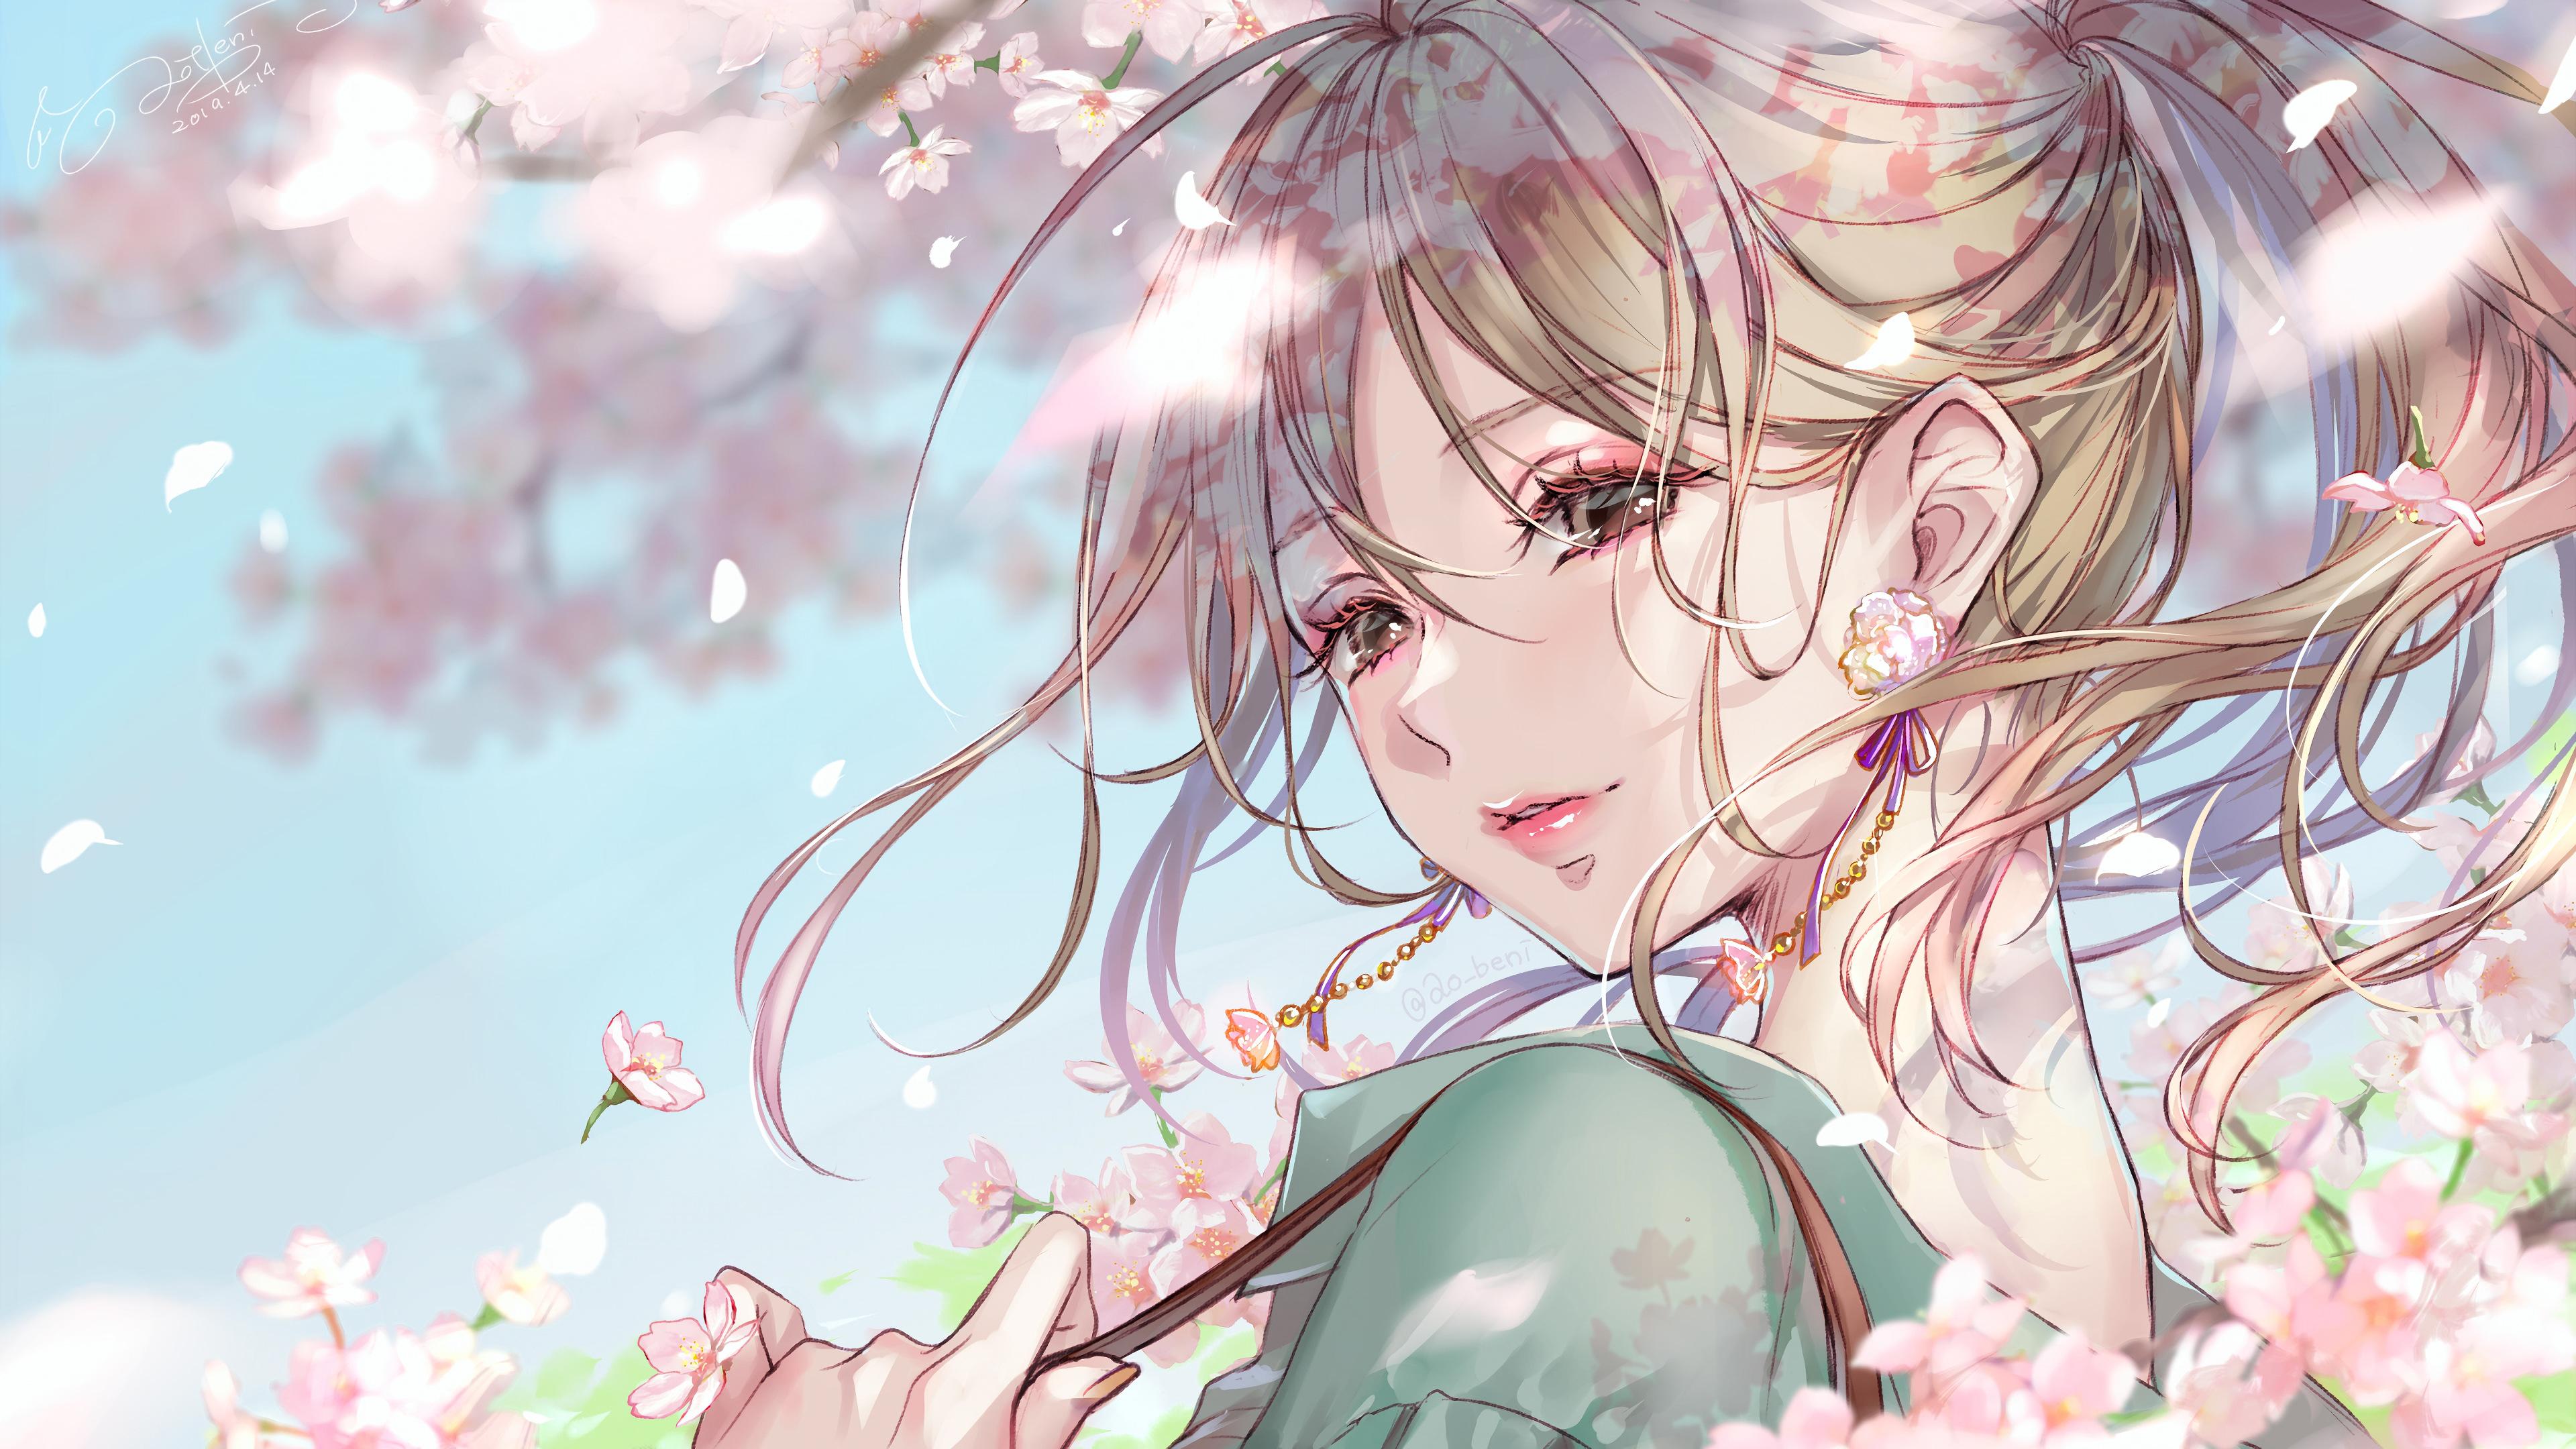 Beautiful Anime Girl 4k Wallpaper 162